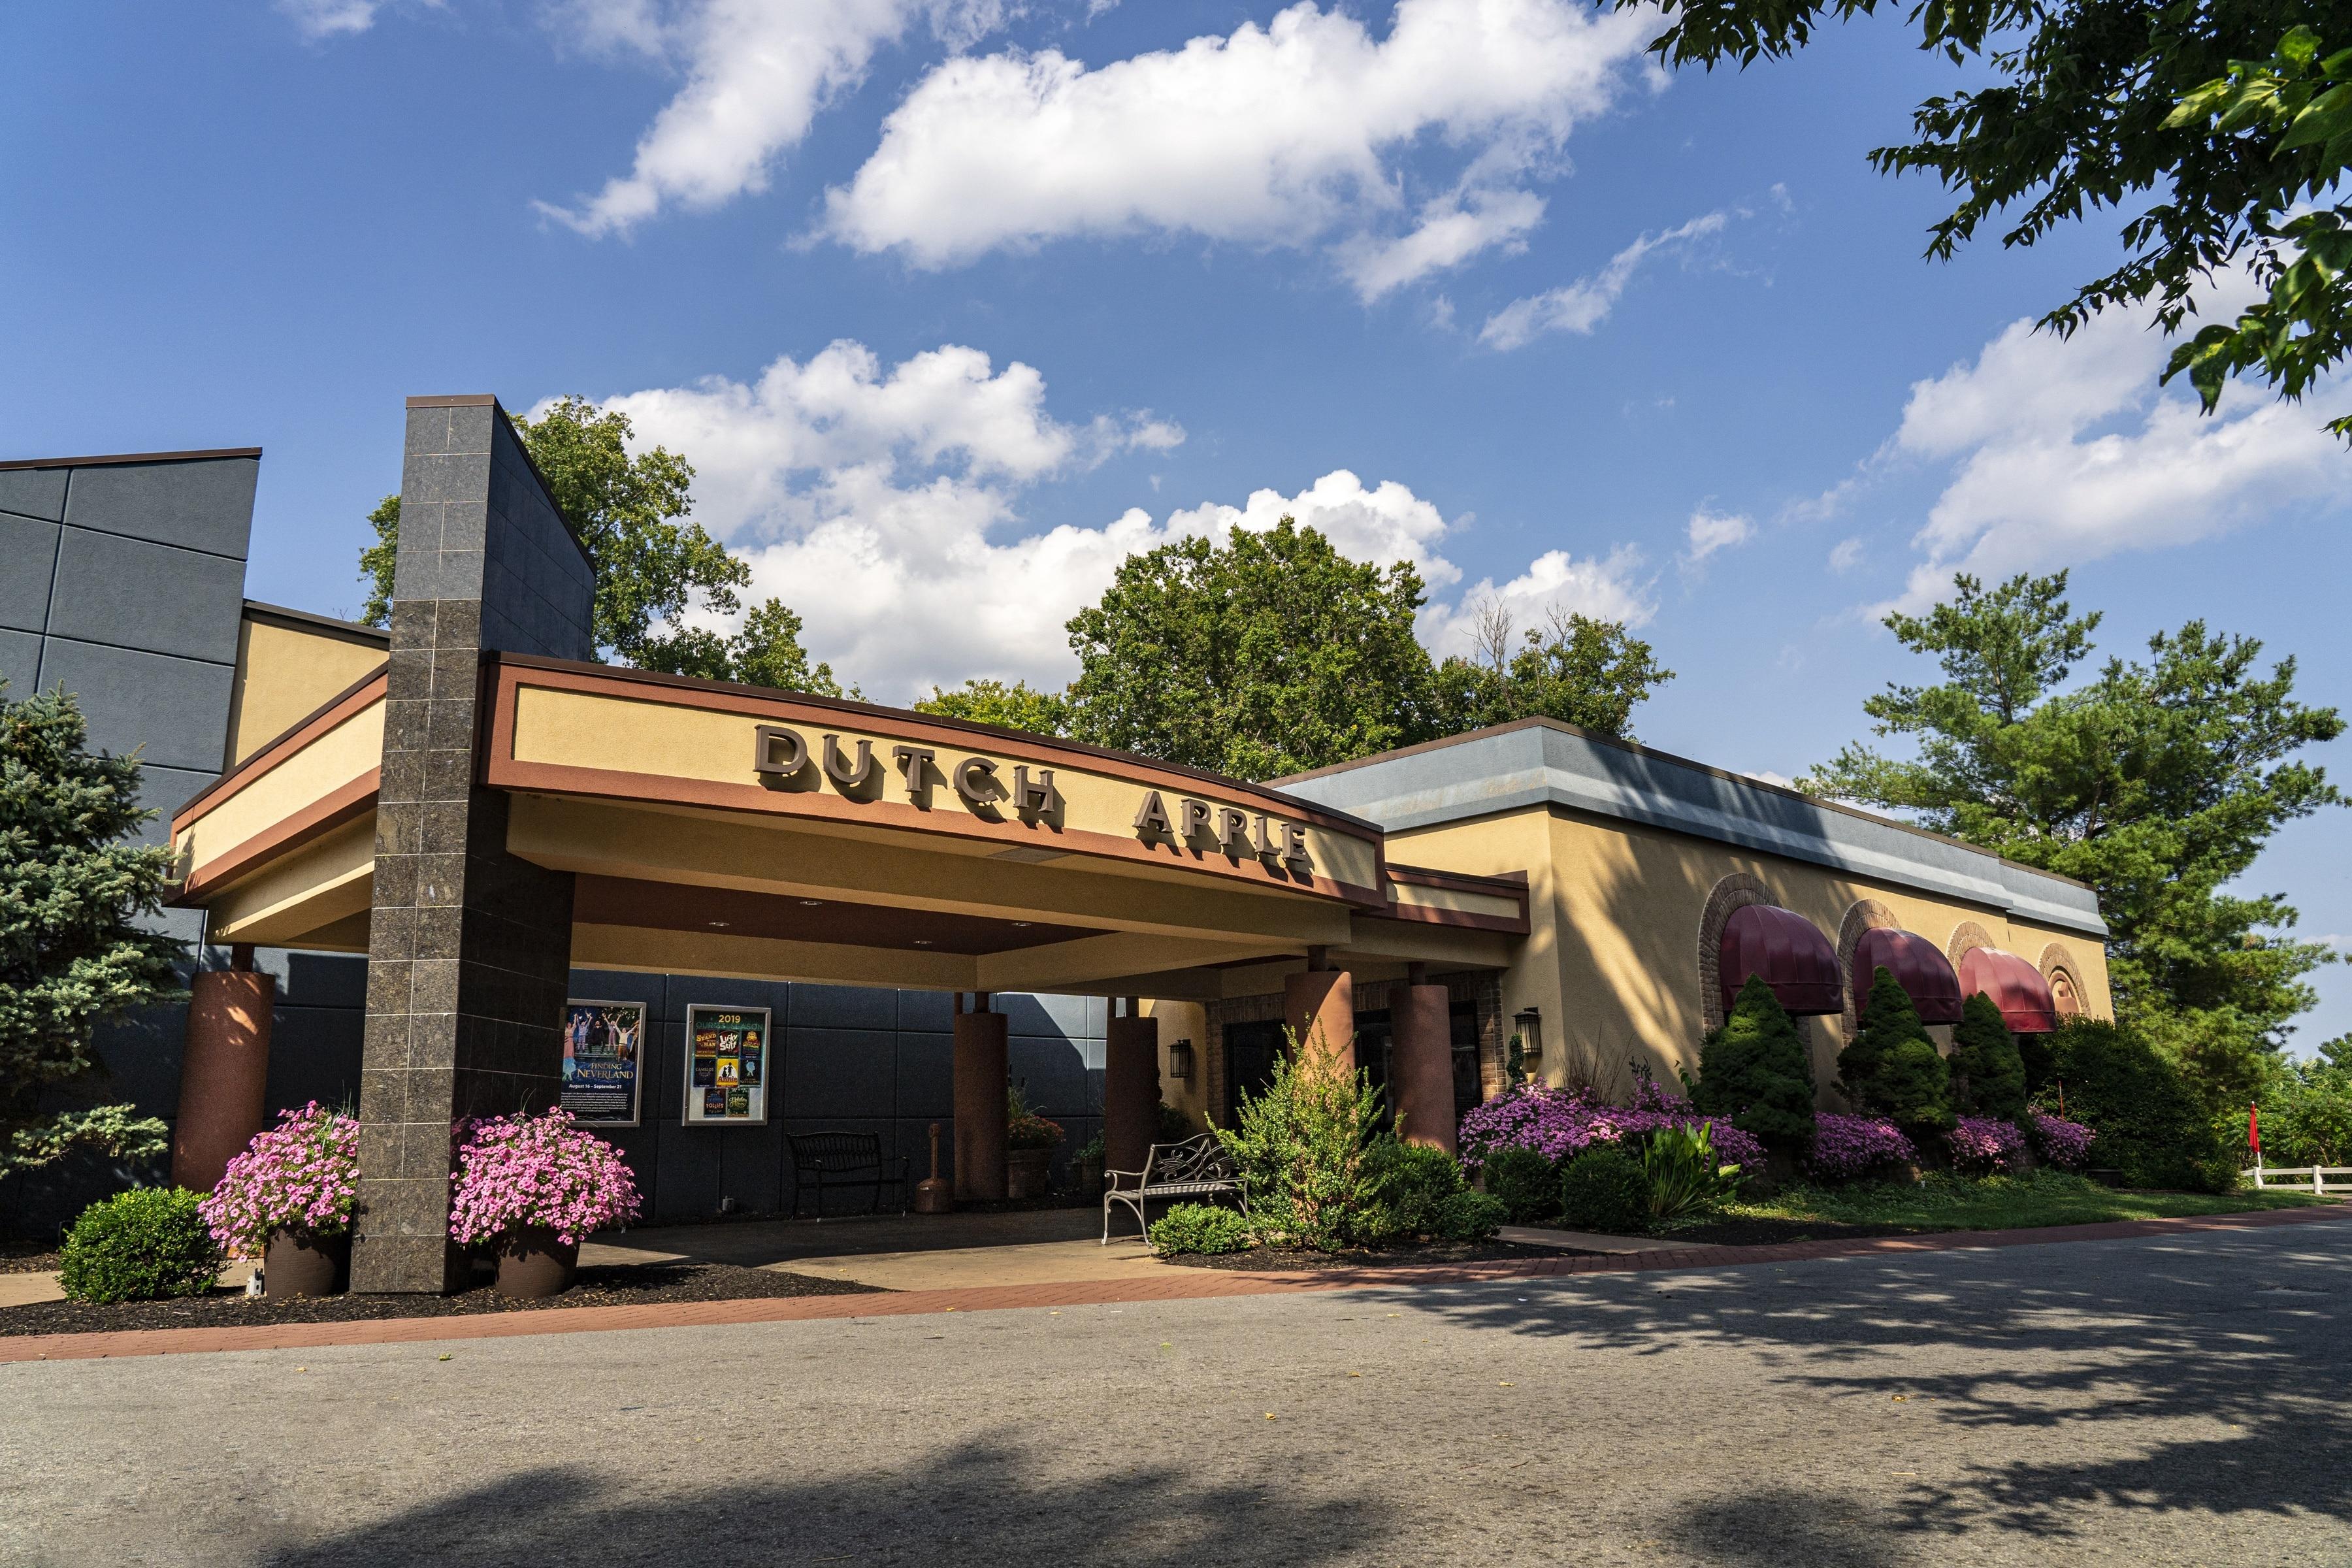 Dutch Apple Dinner Theatre, Lancaster, Pennsylvania, United States of America